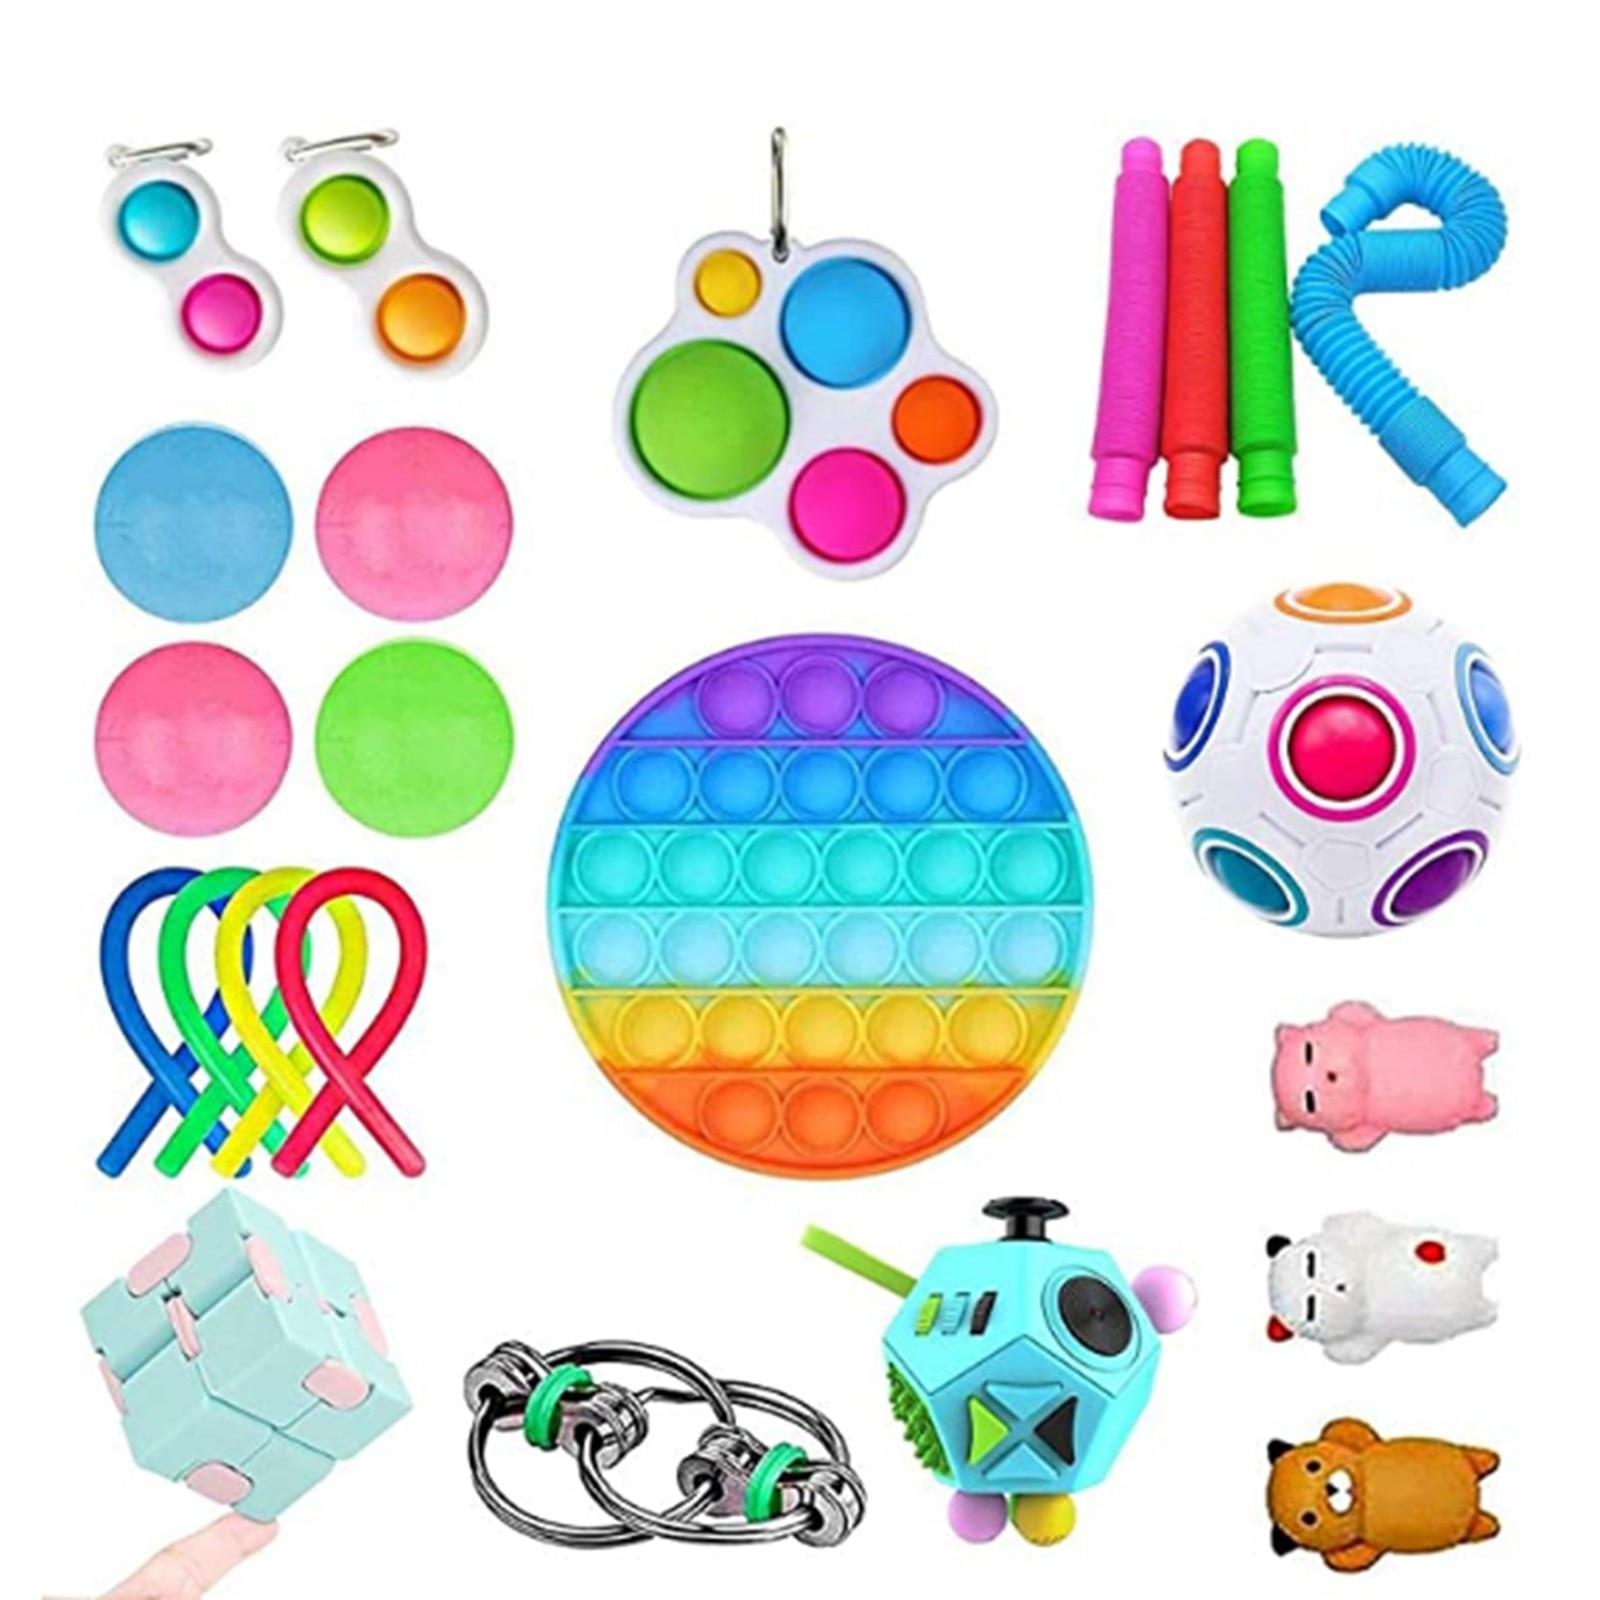 22pc/26pc Creative Adults Fidget Toy Set Cheap Sensory Fidget Toys Pack Children Squishy Sensory Antistress Relief Figet Toys